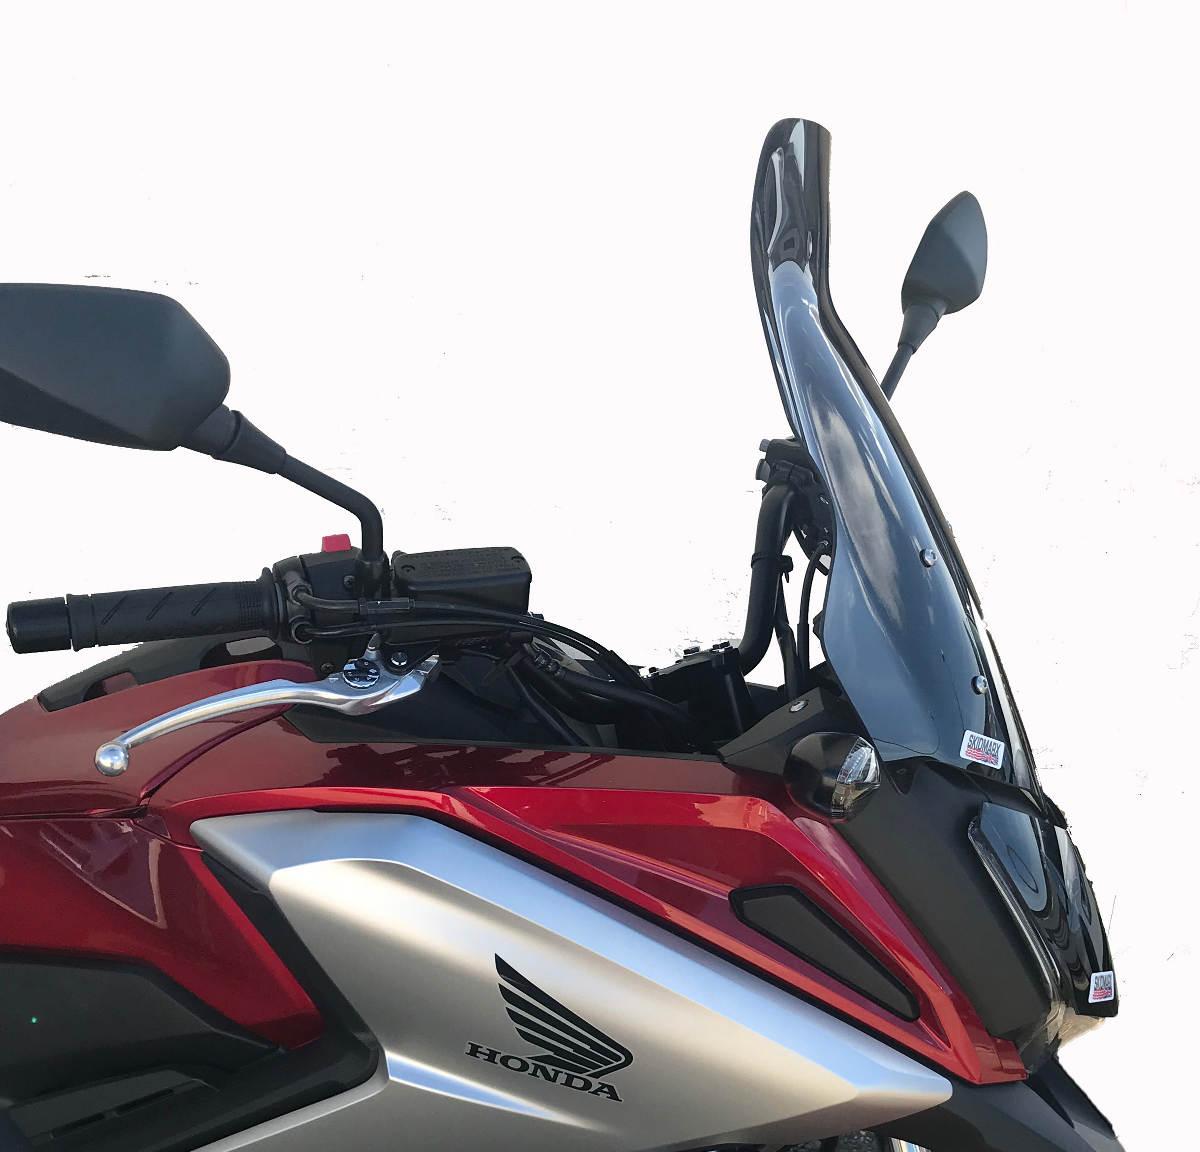 Honda NC750X Hugger and Screen from Skidmarx - Screen Detail